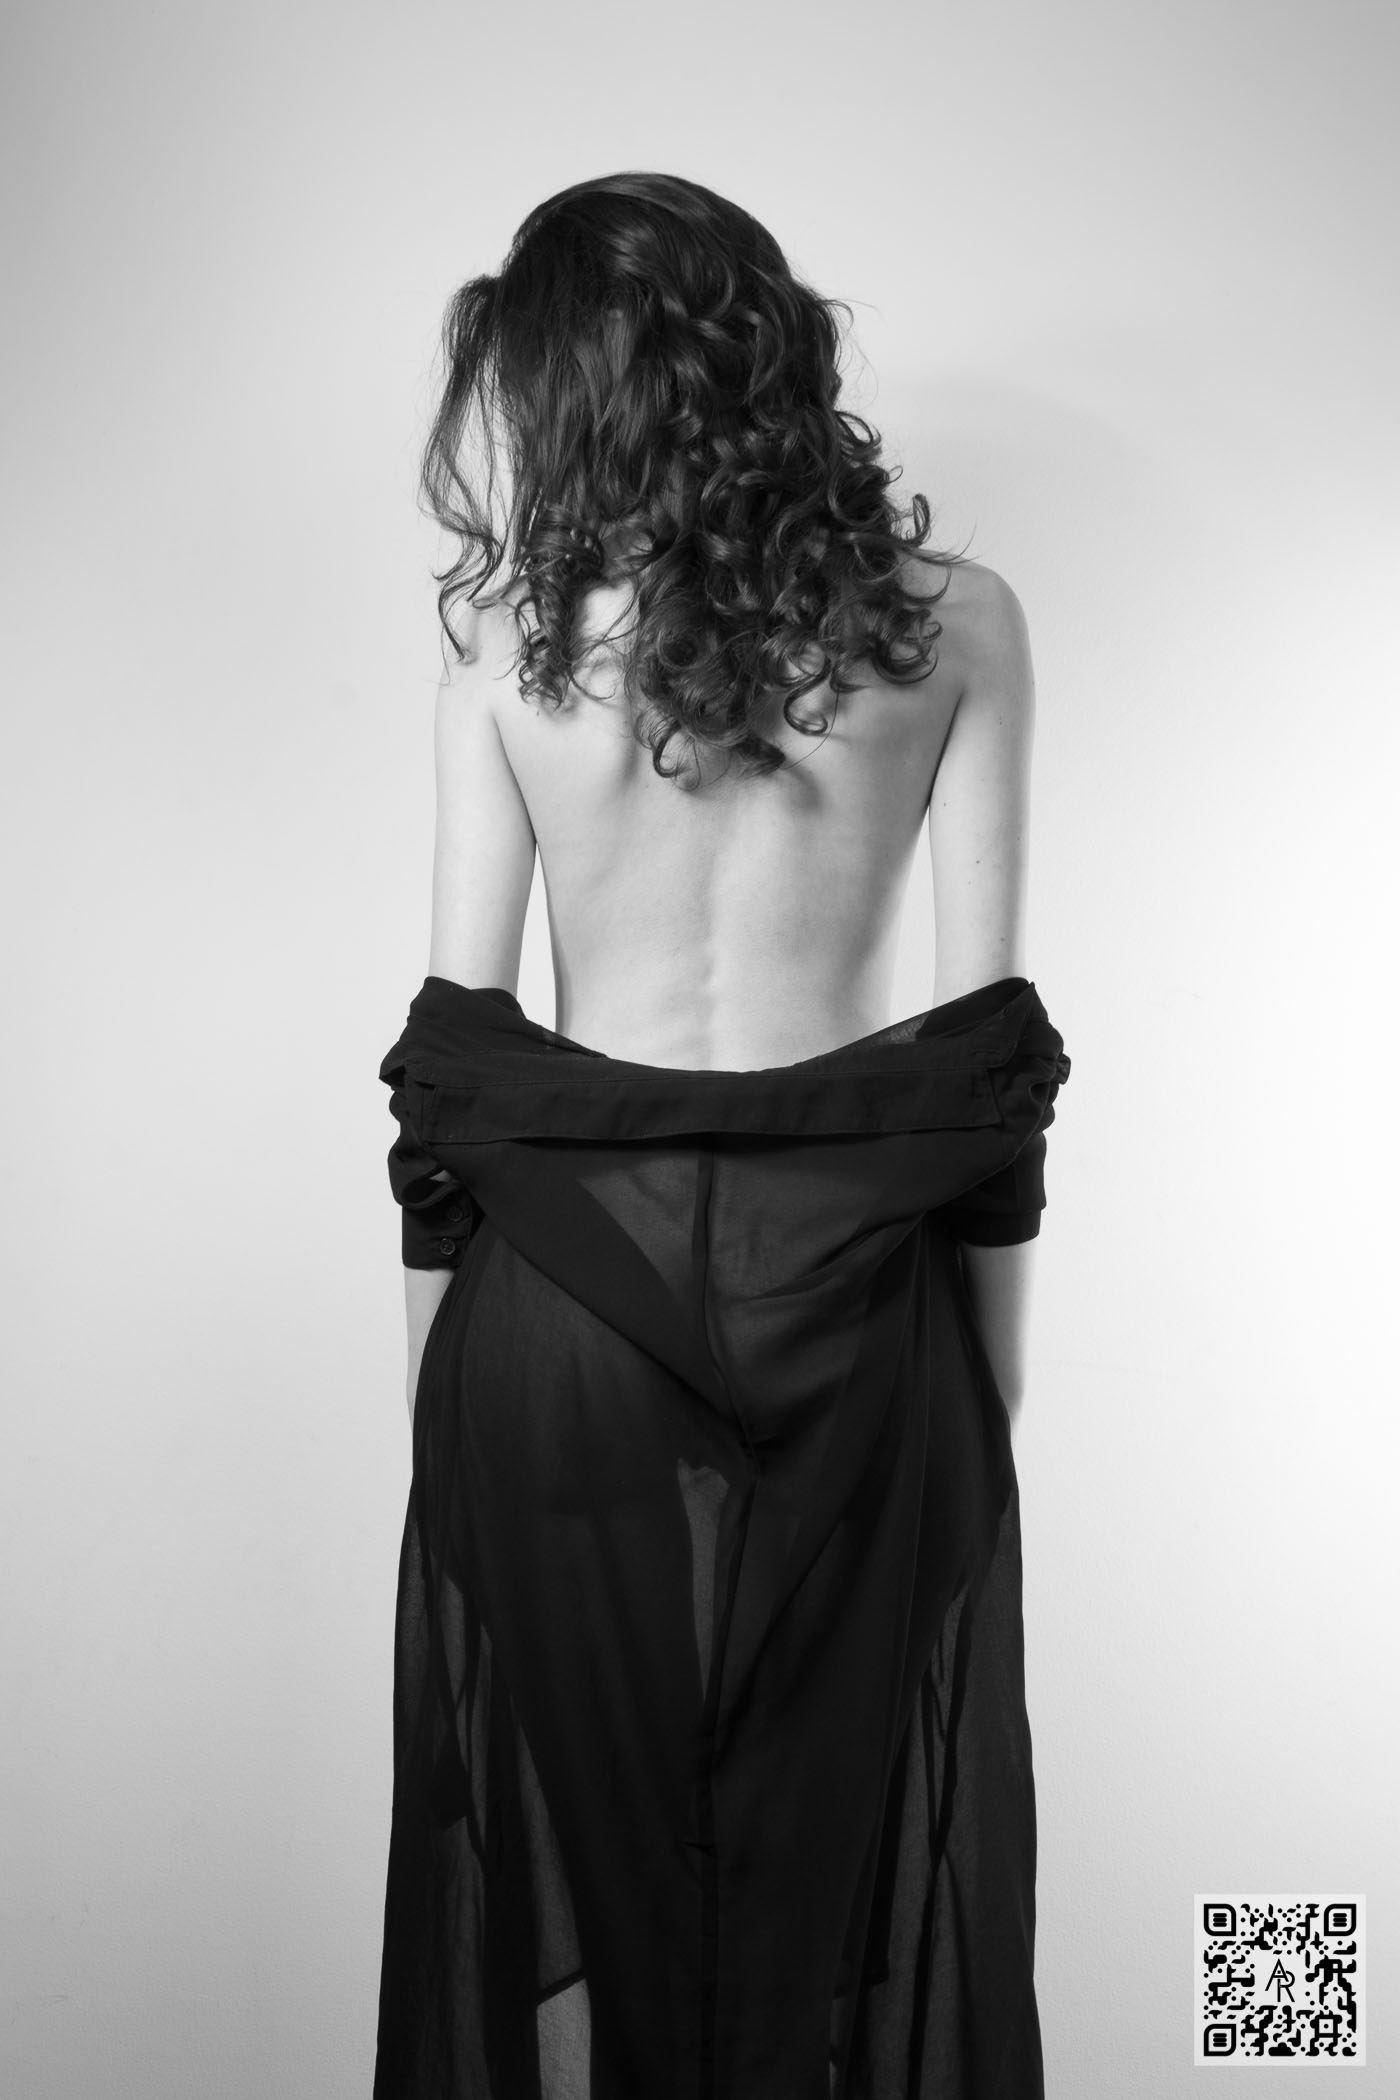 Iulia Mardare – Sheer Perfection